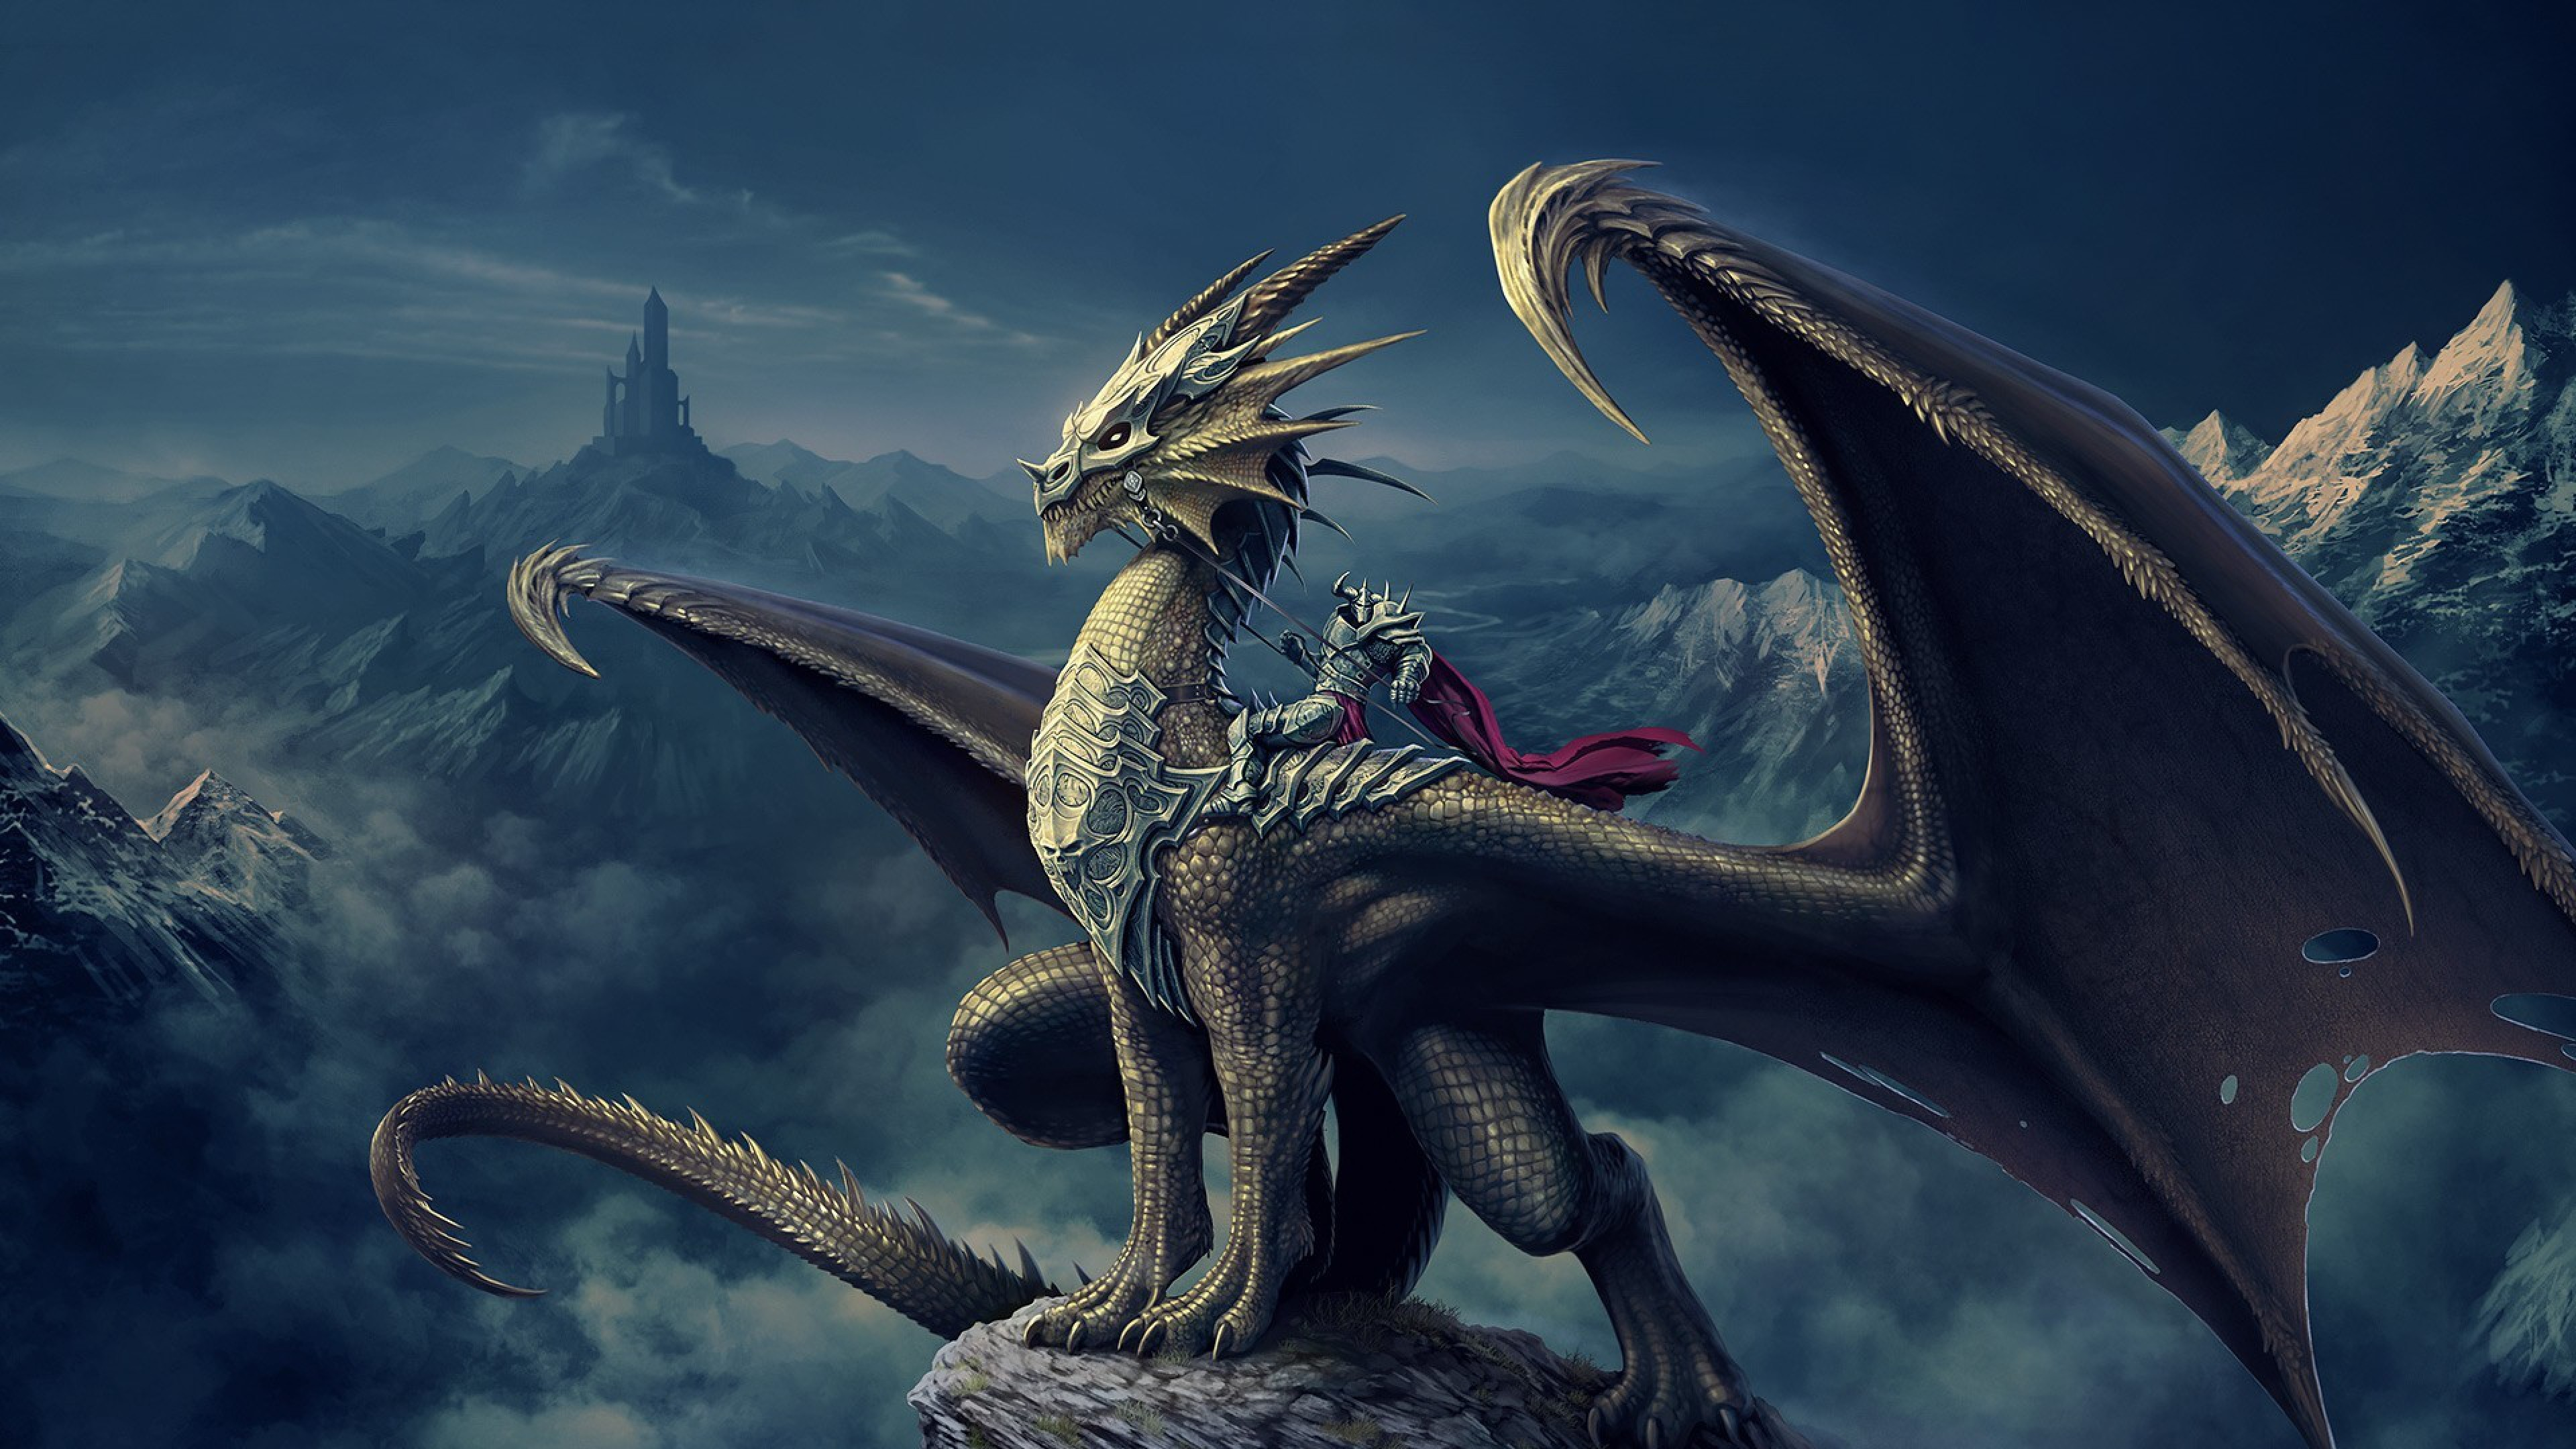 4k Dragon Wallpaper 50 Images